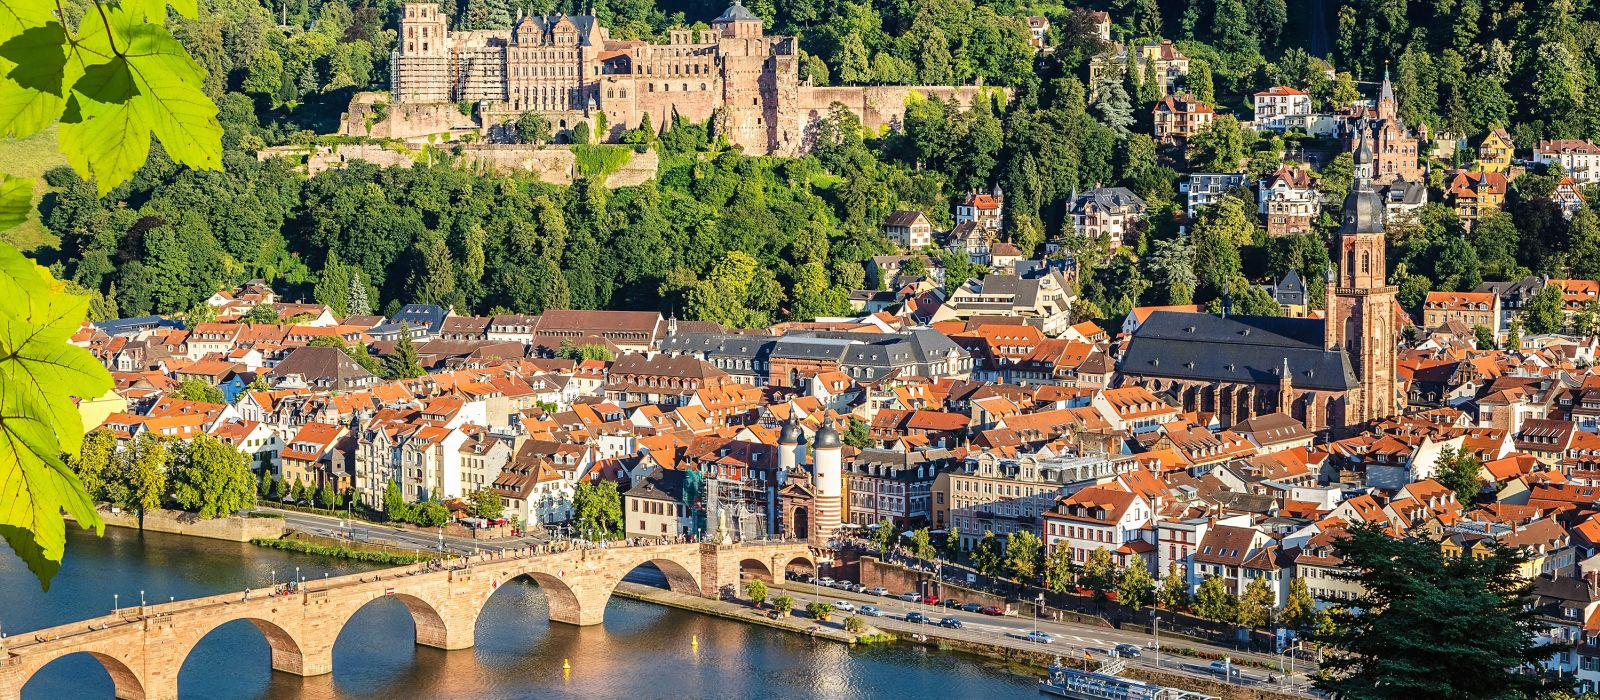 Destination Heidelberg Germany